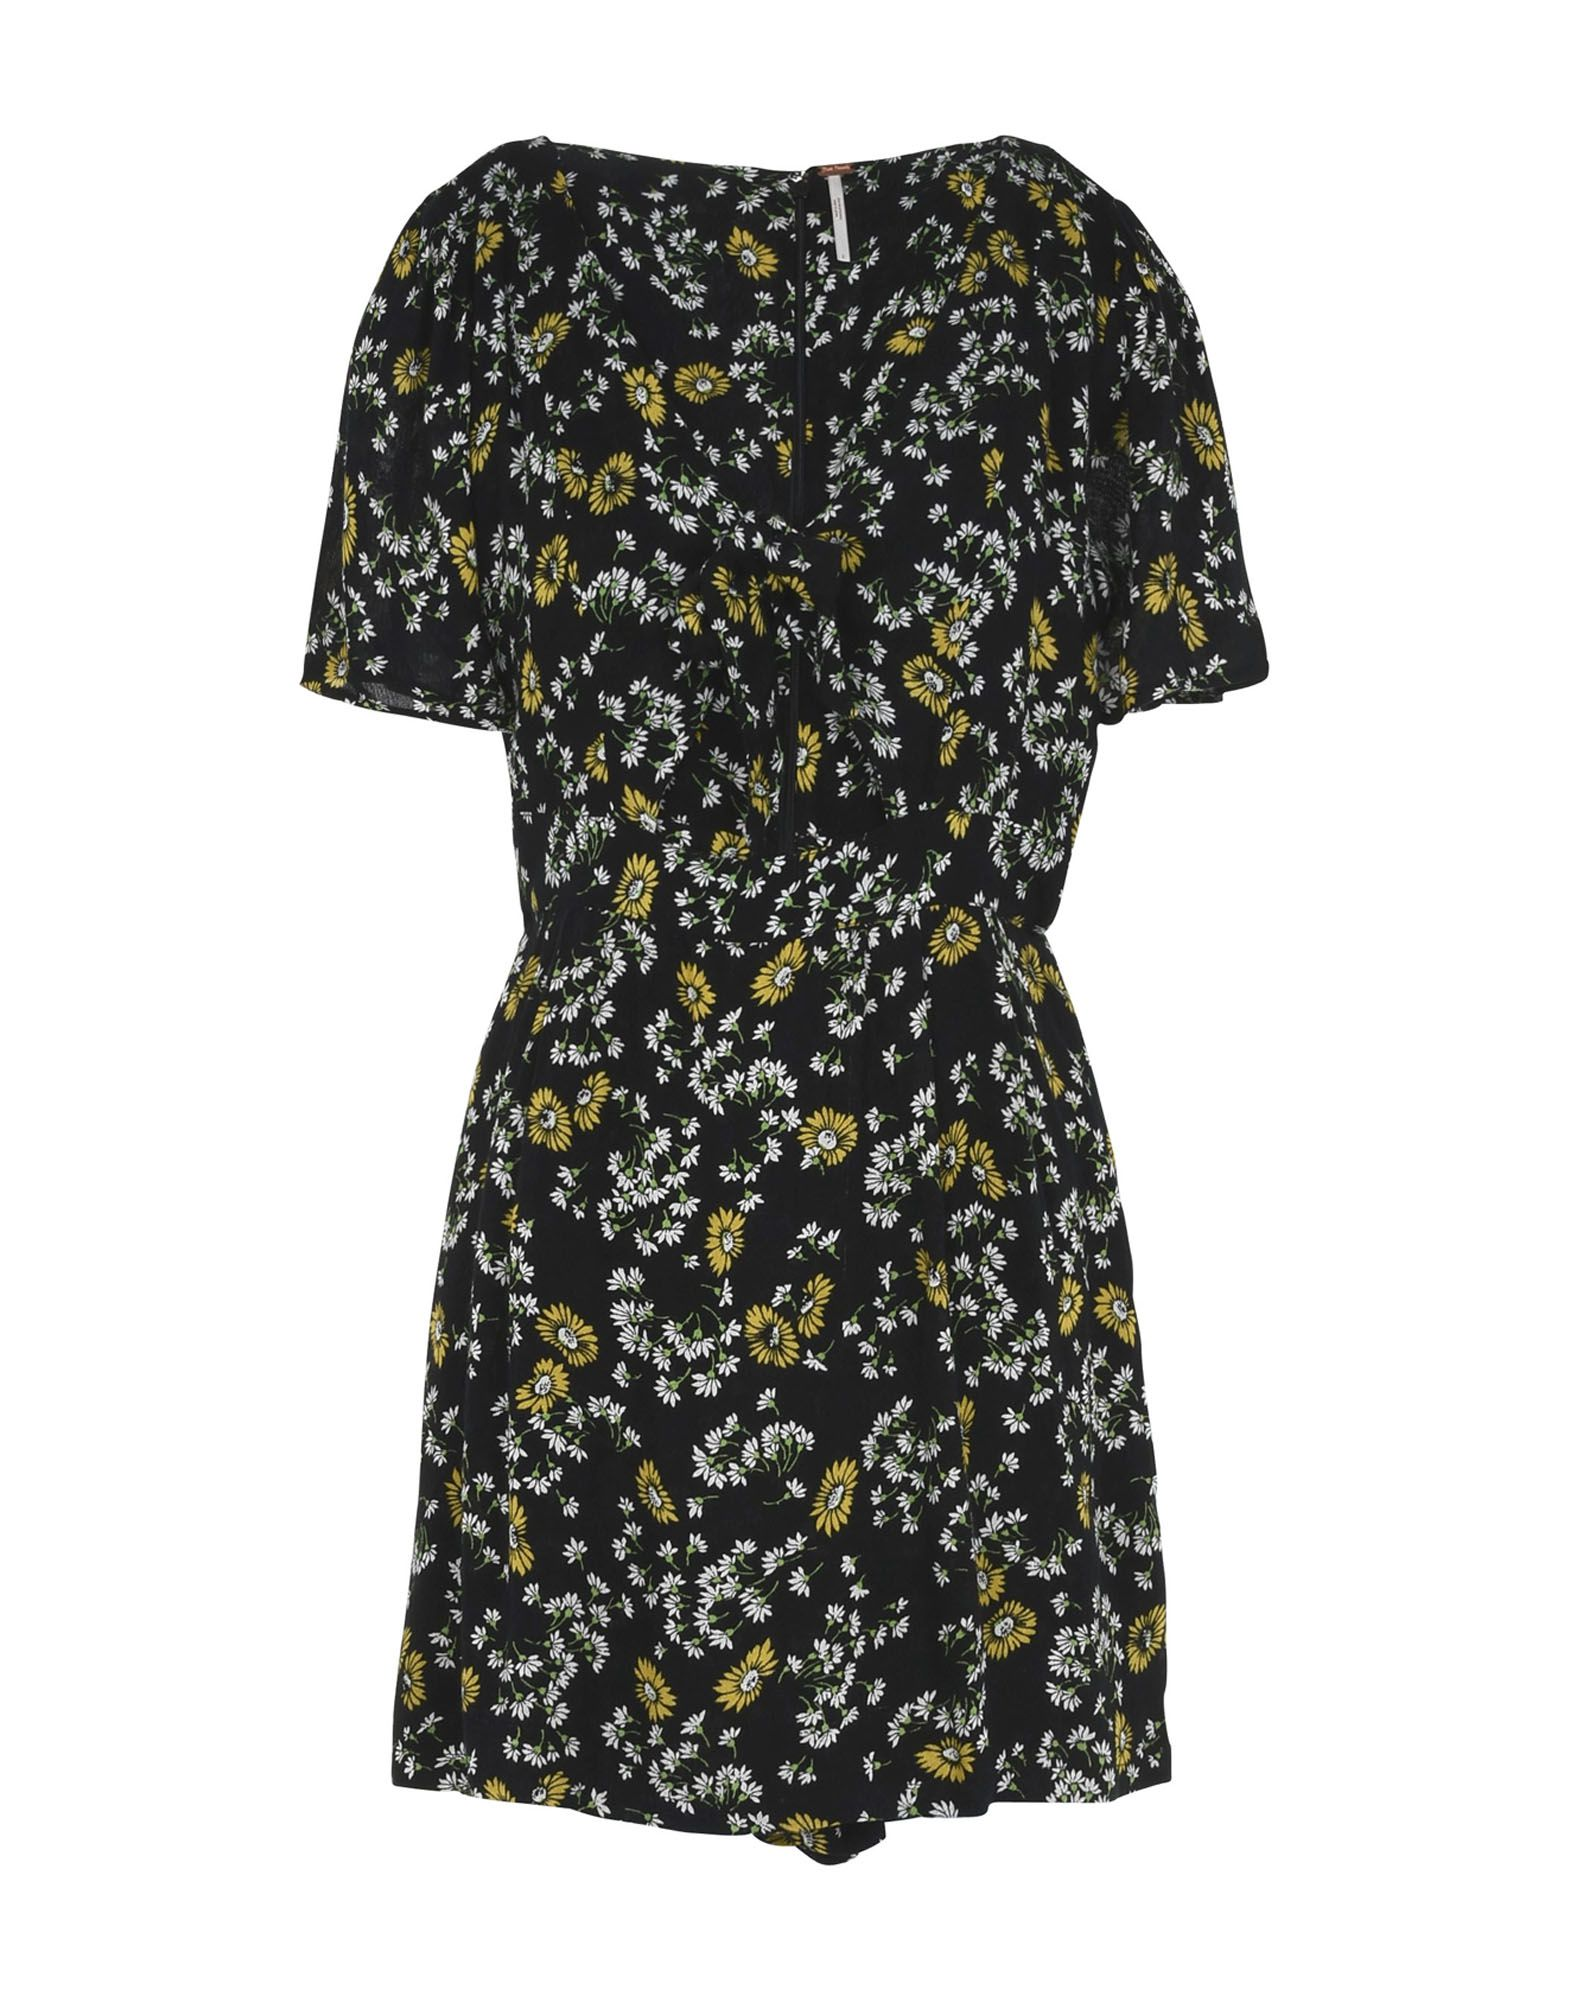 FREE PEOPLE Damen Kurzes Kleid Farbe Schwarz Größe 5